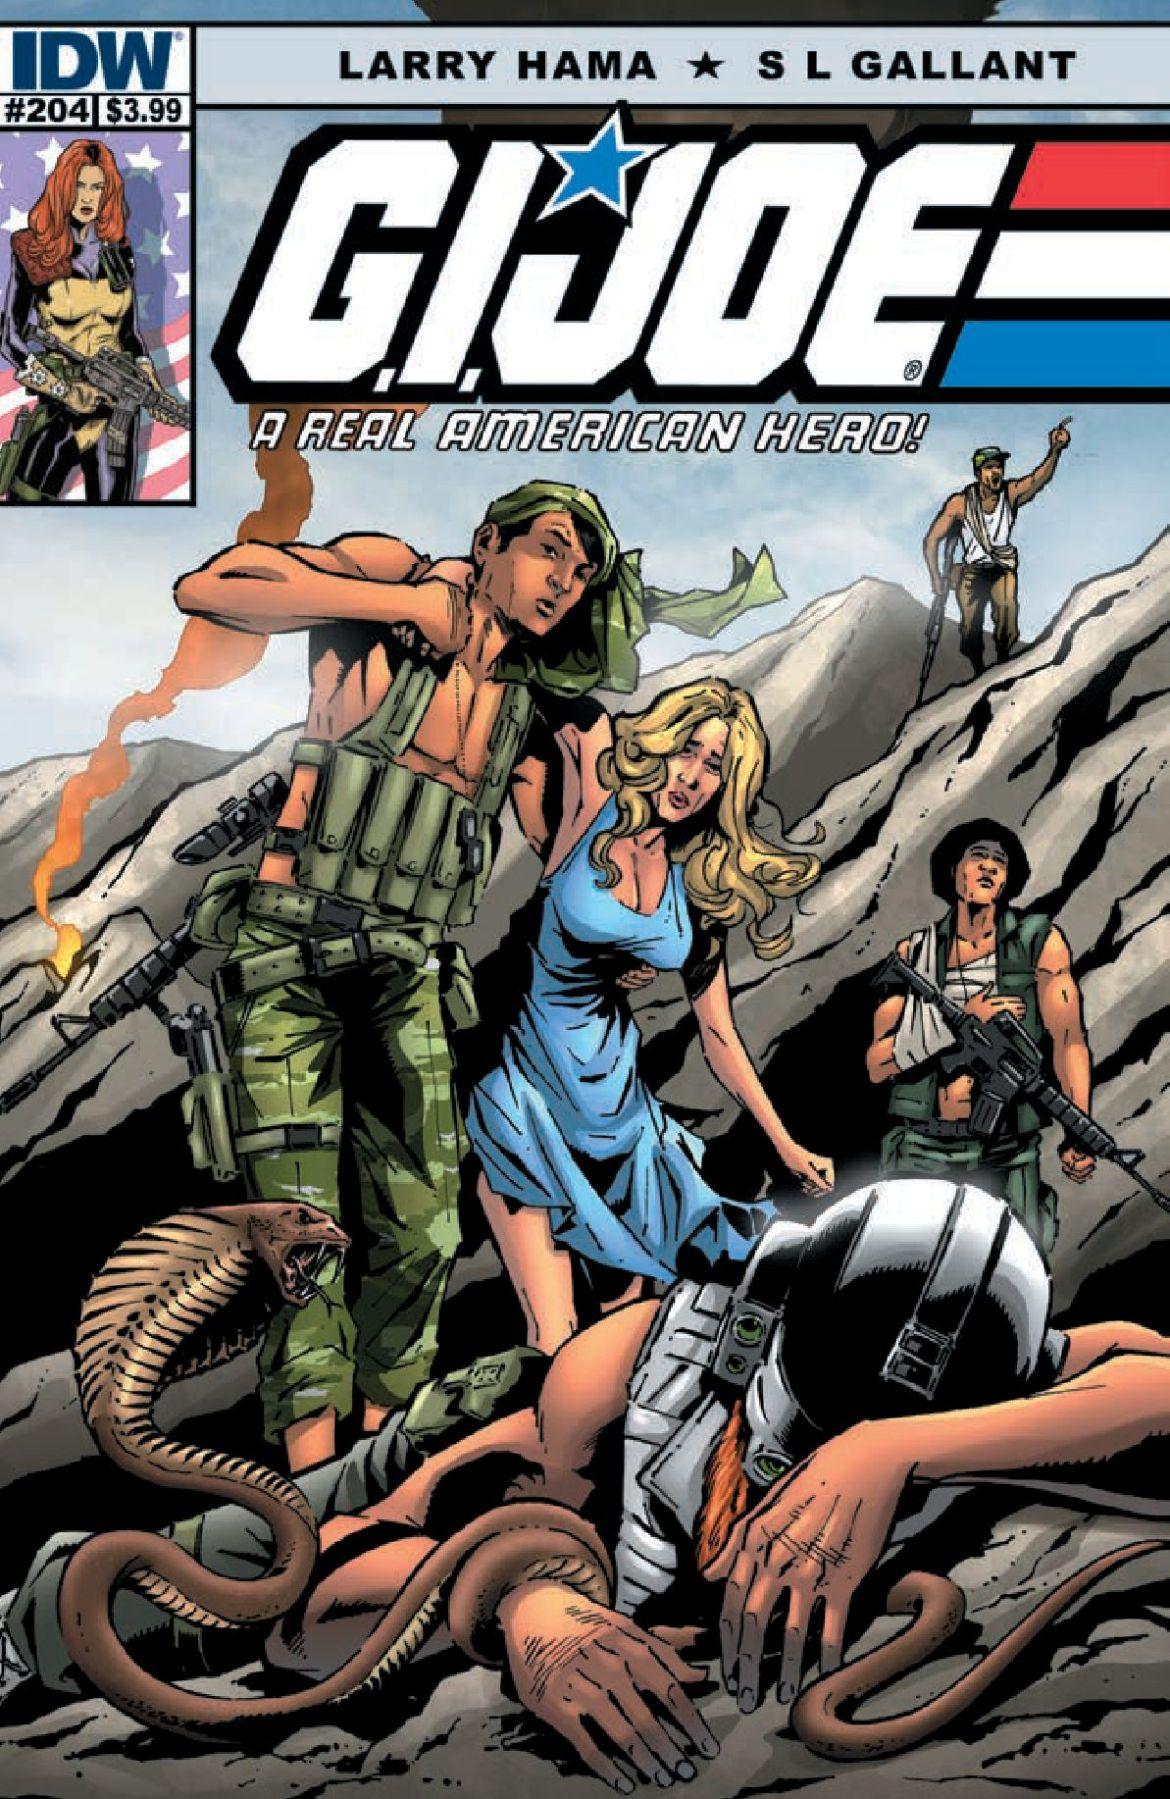 G.I. Joe A Real American Hero #204 Preview